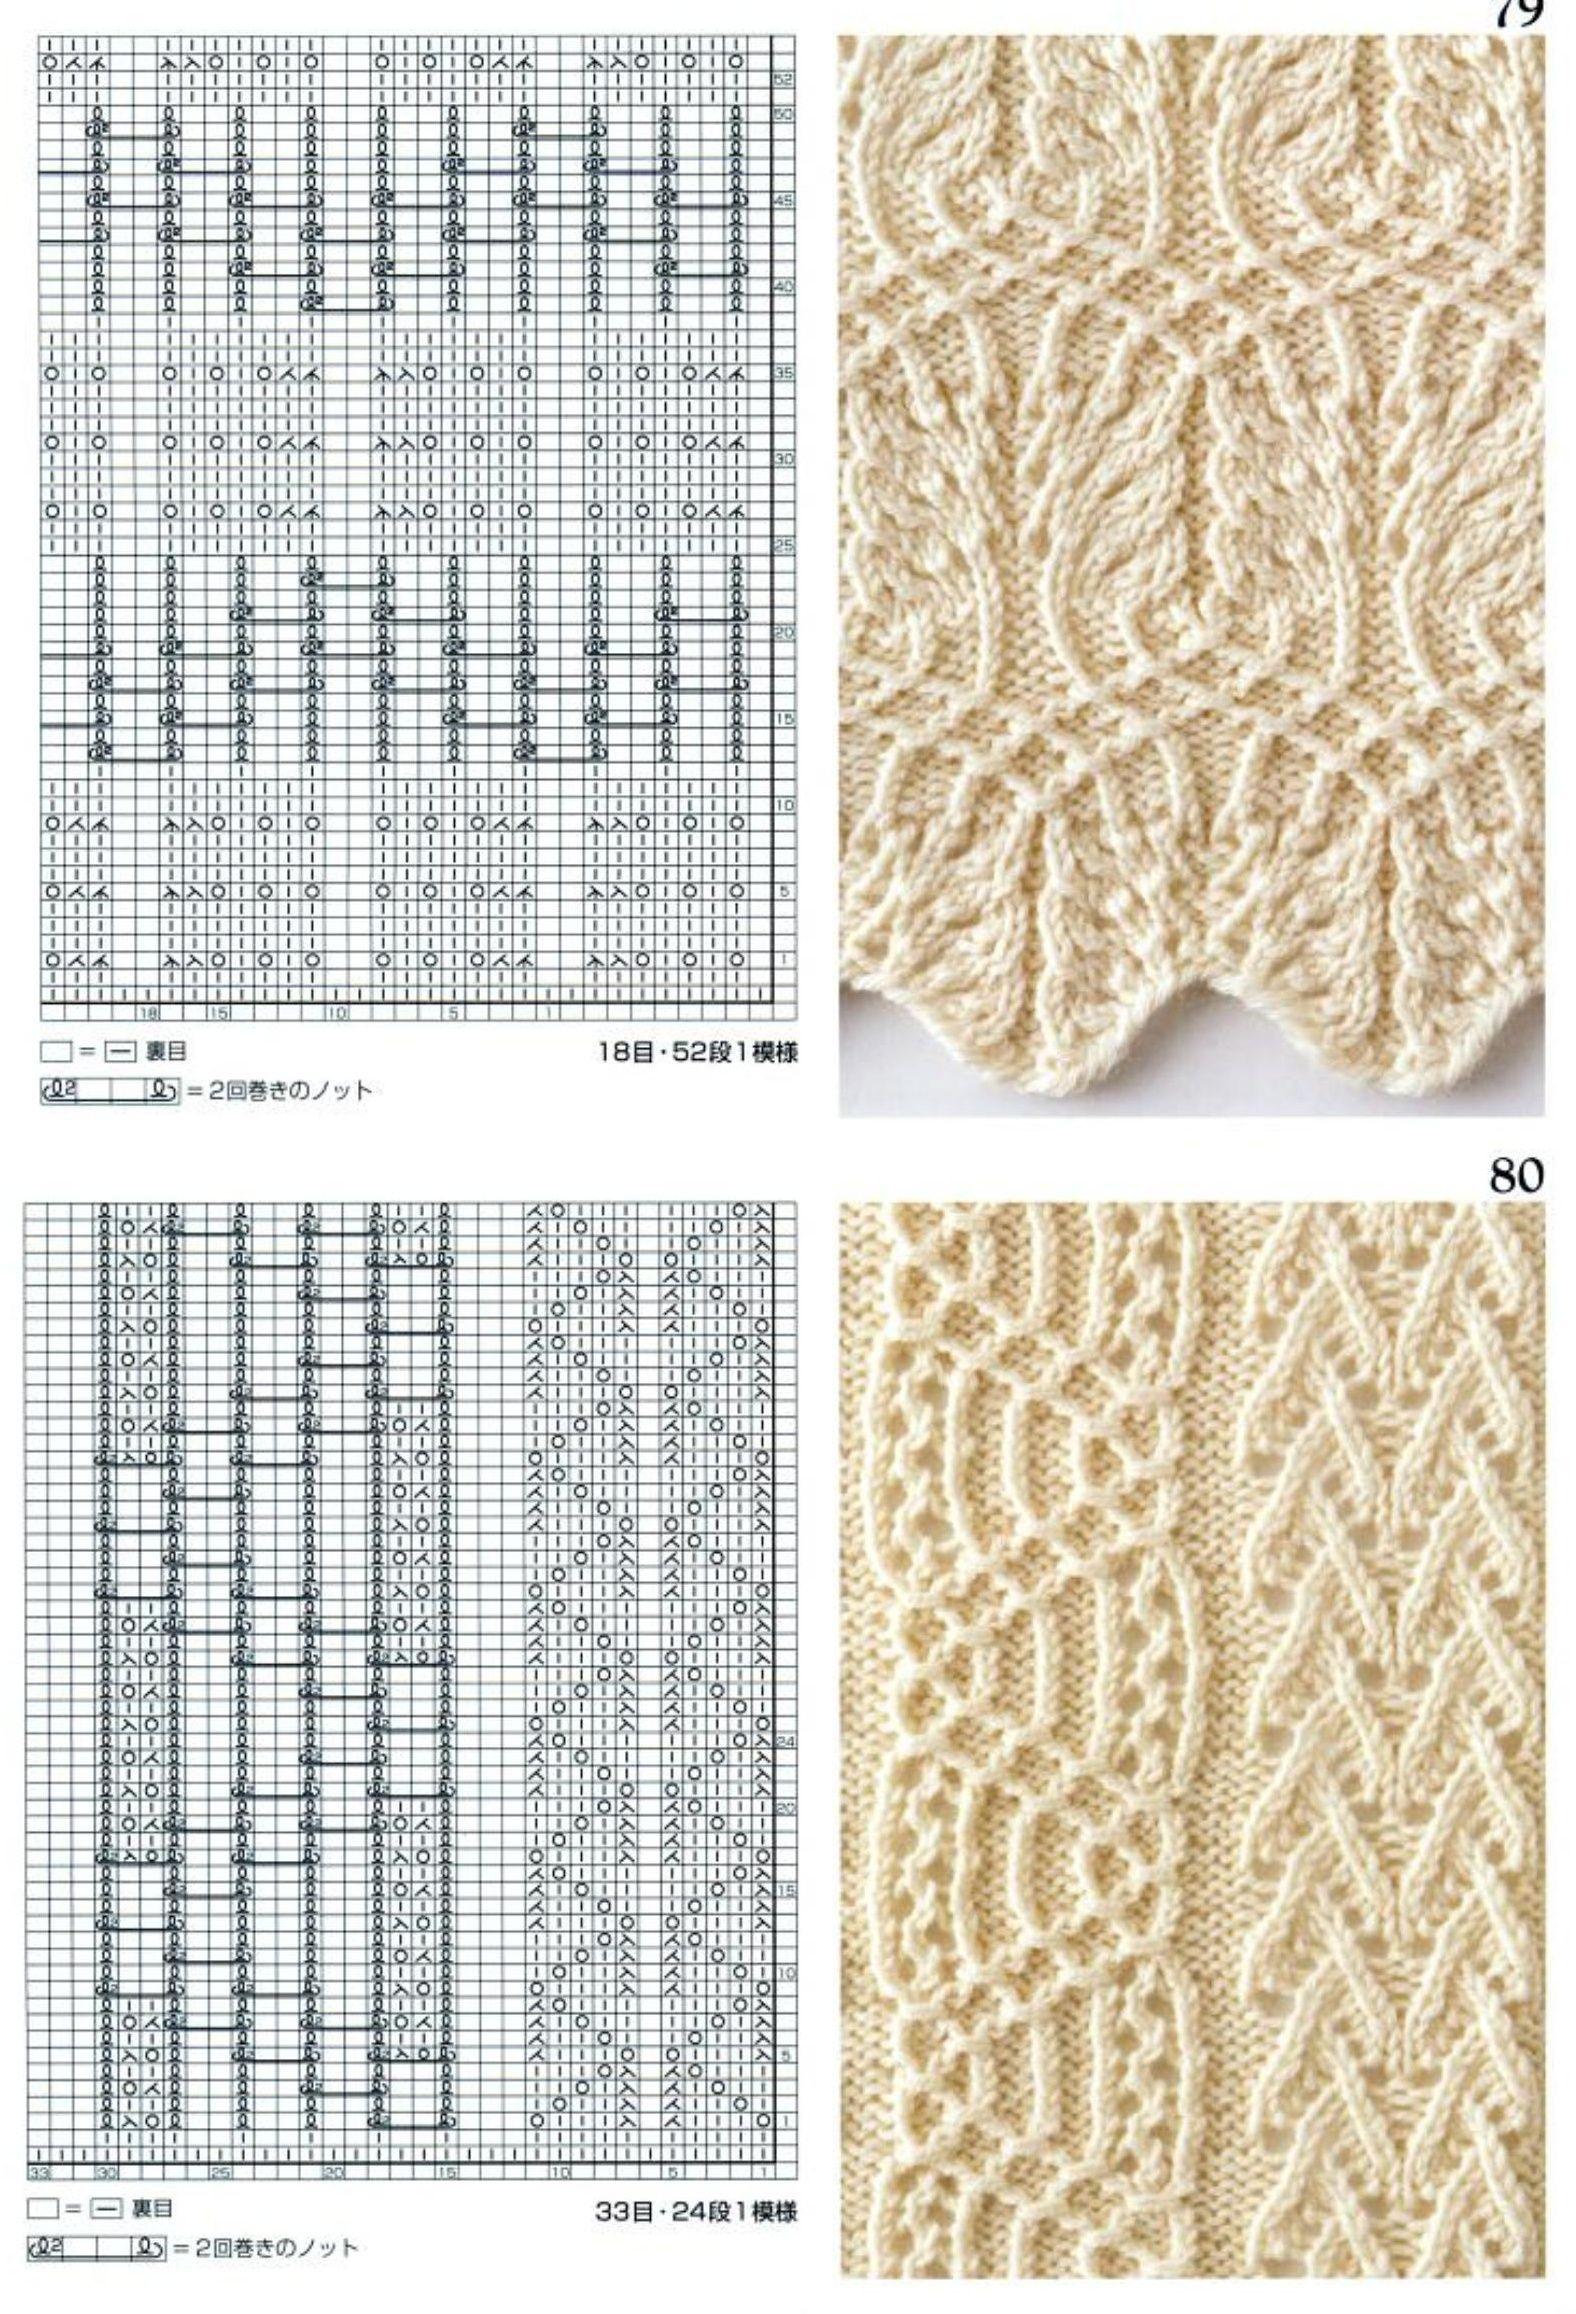 KNITTING PATTERN BOOK 260 BY HITOMI SHIDA | Вязание. Узоры, схемы ...